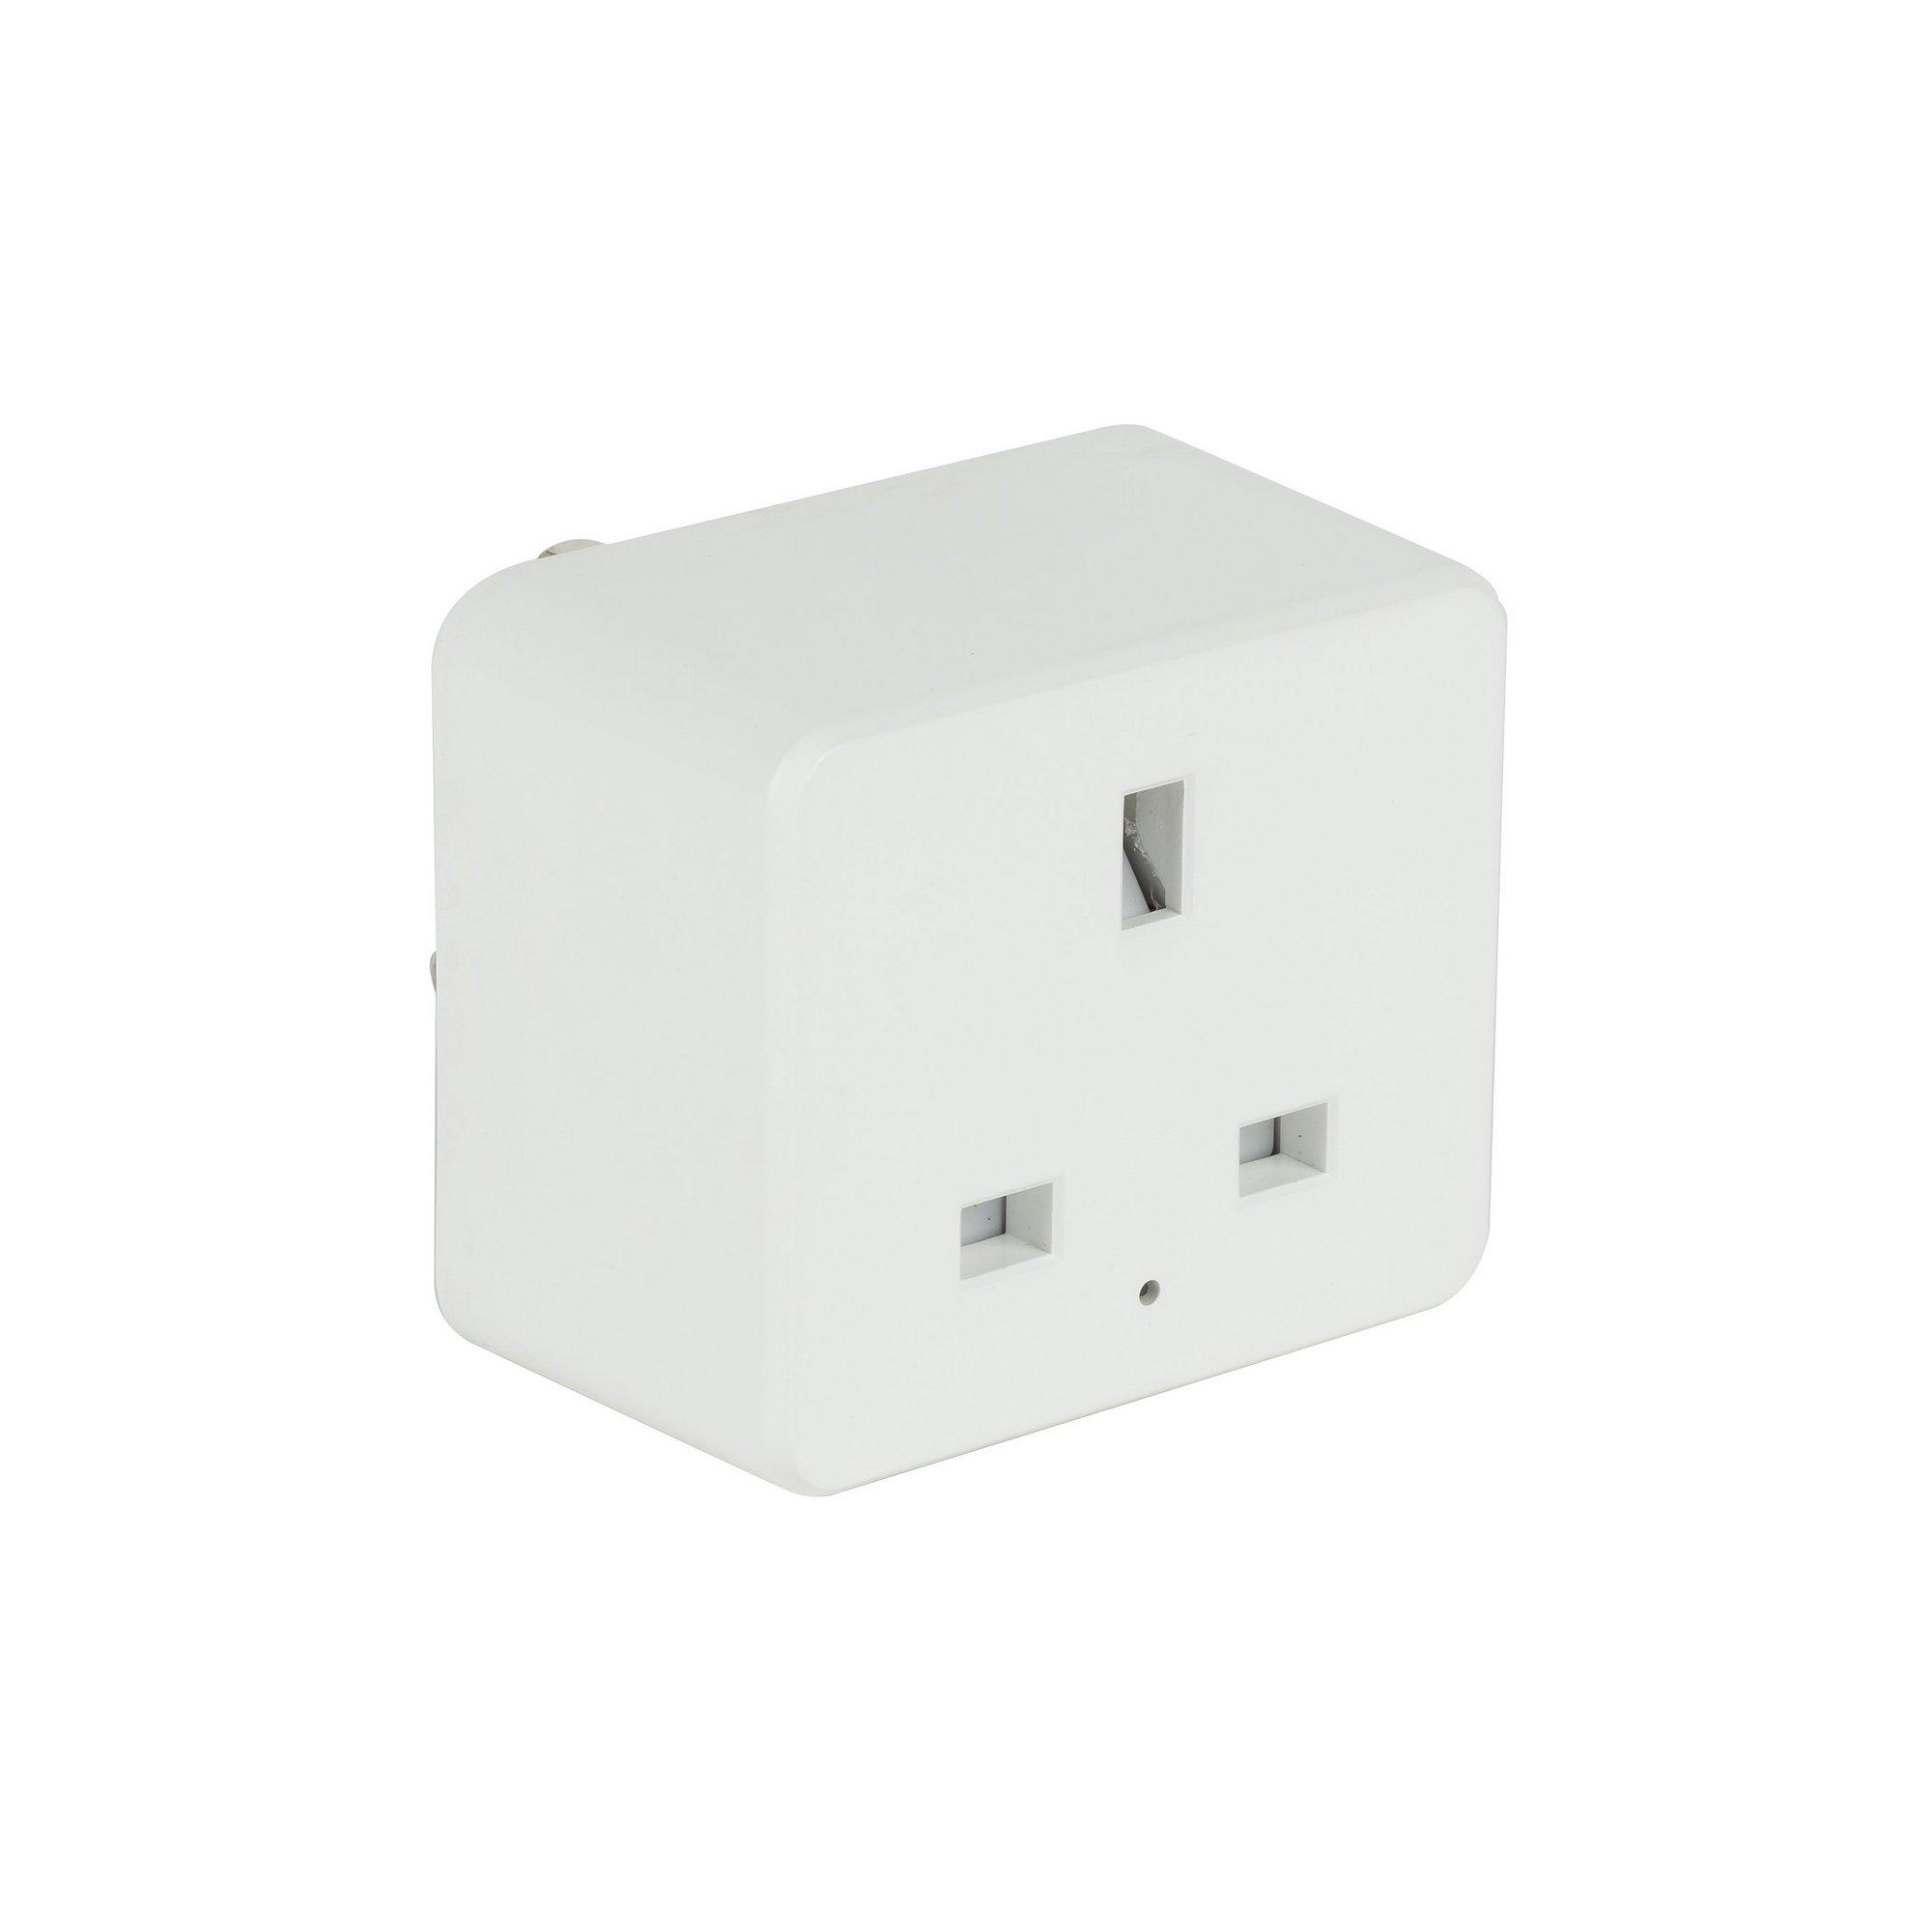 Image of Intempo Home UK Smart Plug